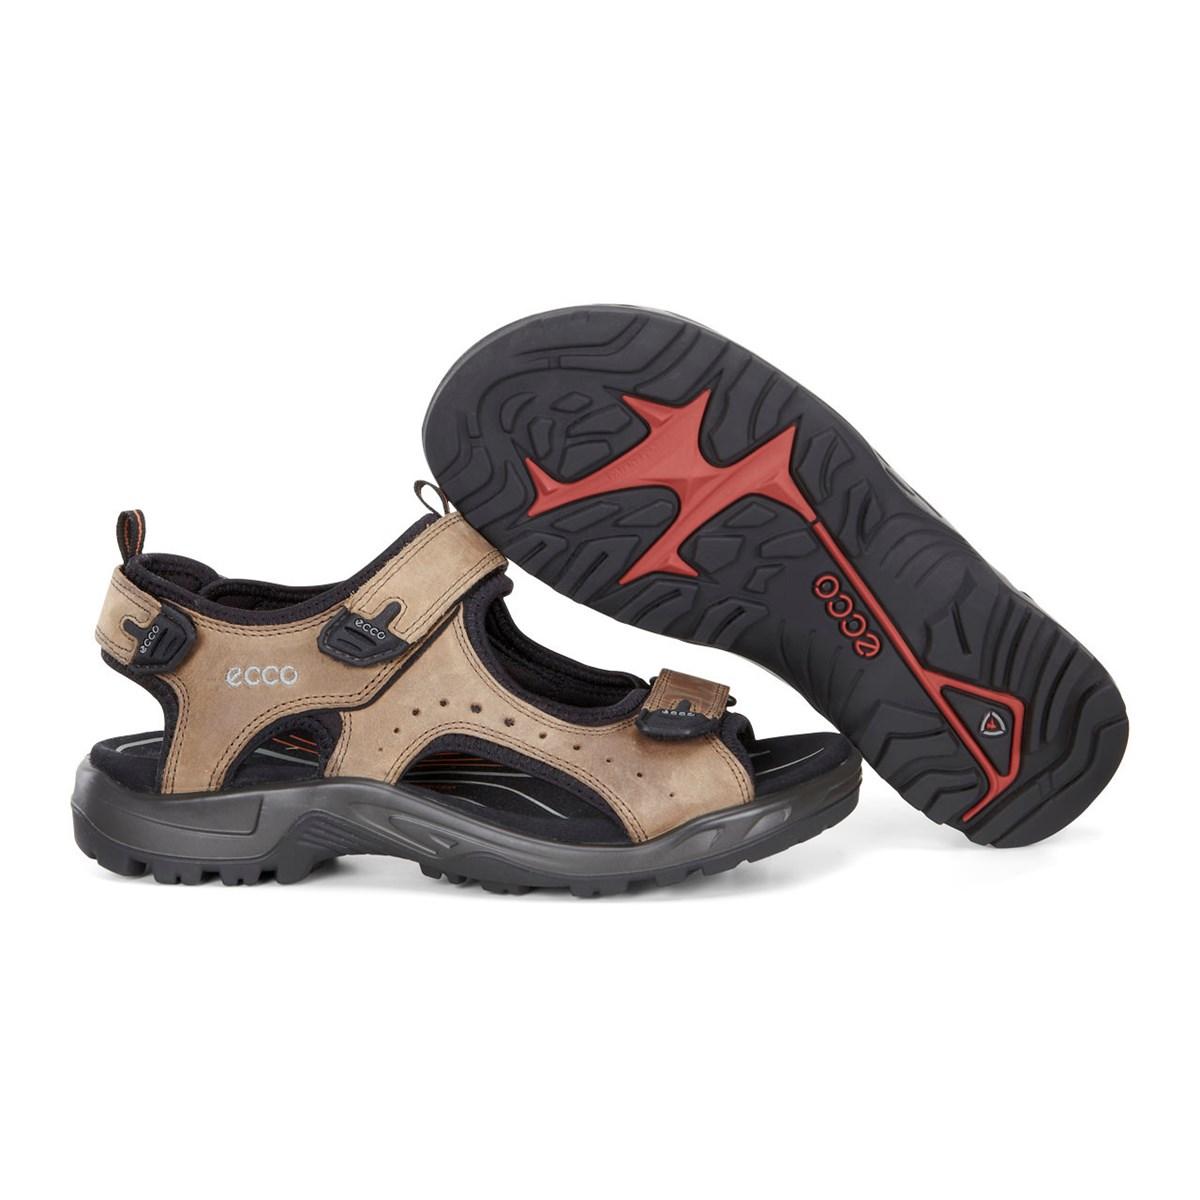 3b76bb7abf0d Sandals - OFFROAD - ECCO Shoes NZ